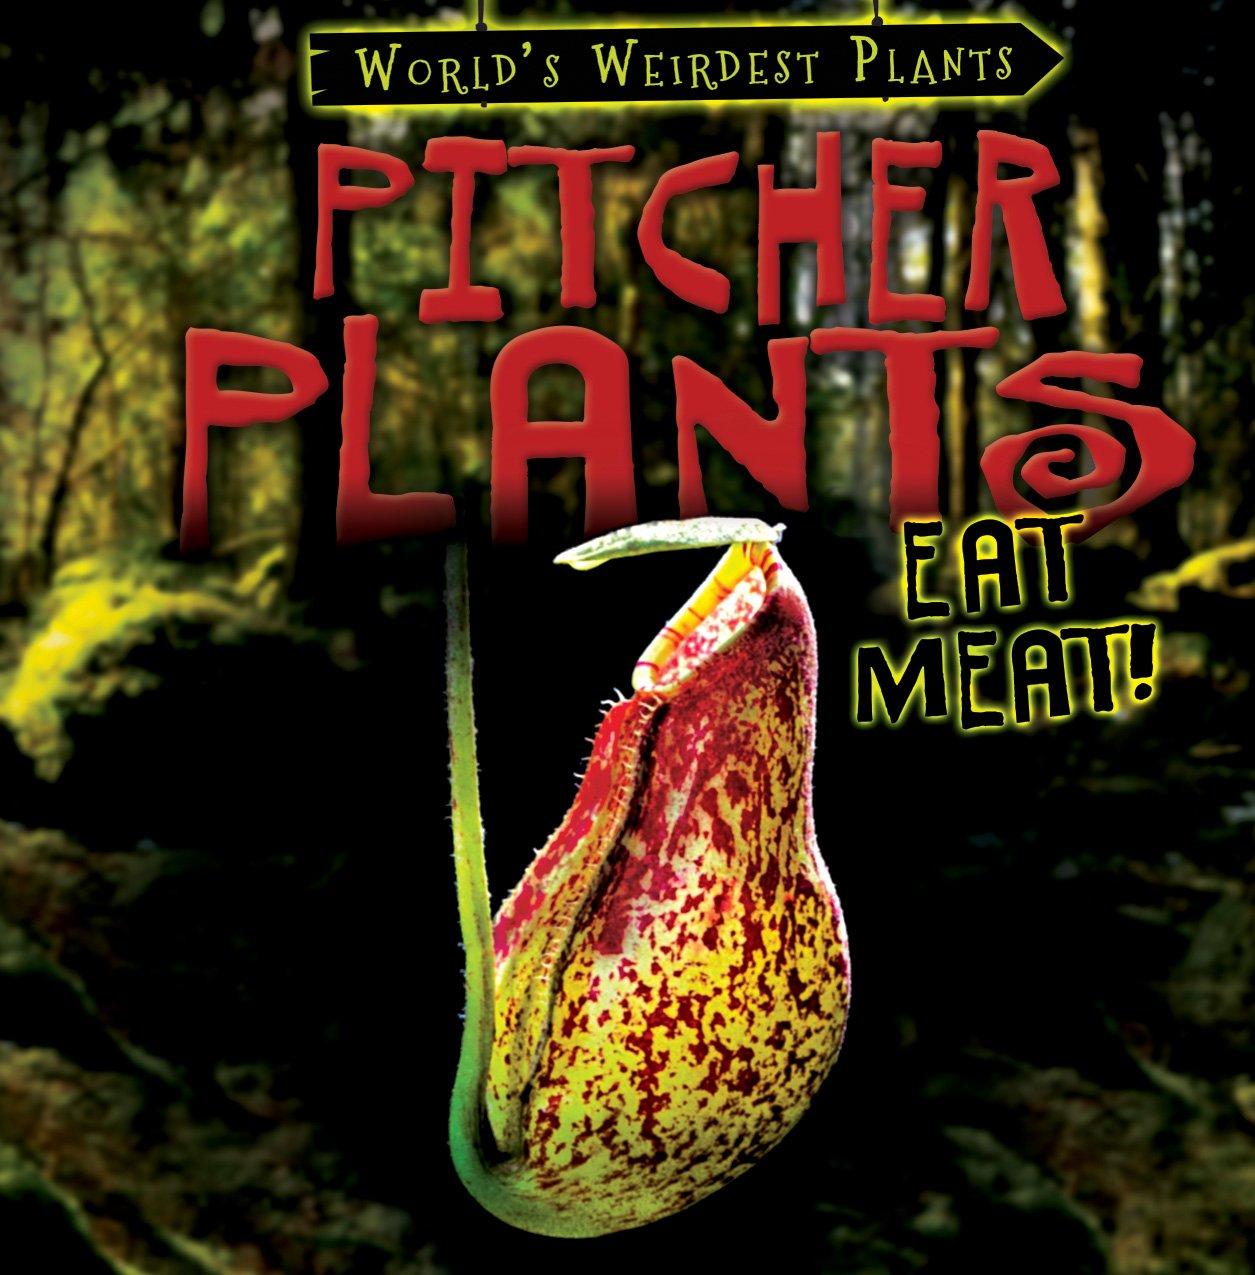 Pitcher Plants Eat Meat! (World's Weirdest Plants)